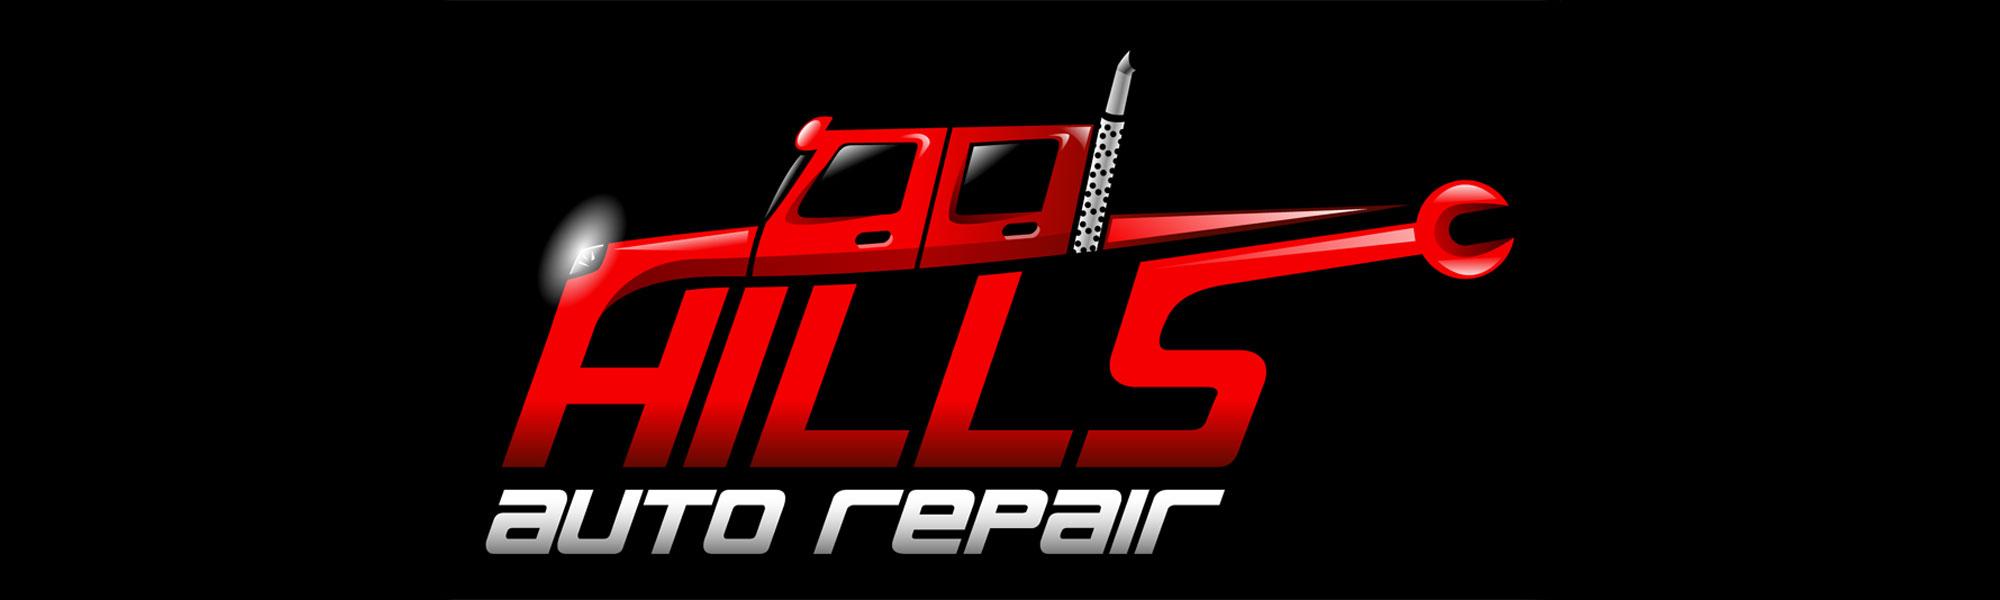 Hill's Auto & Engine Repair